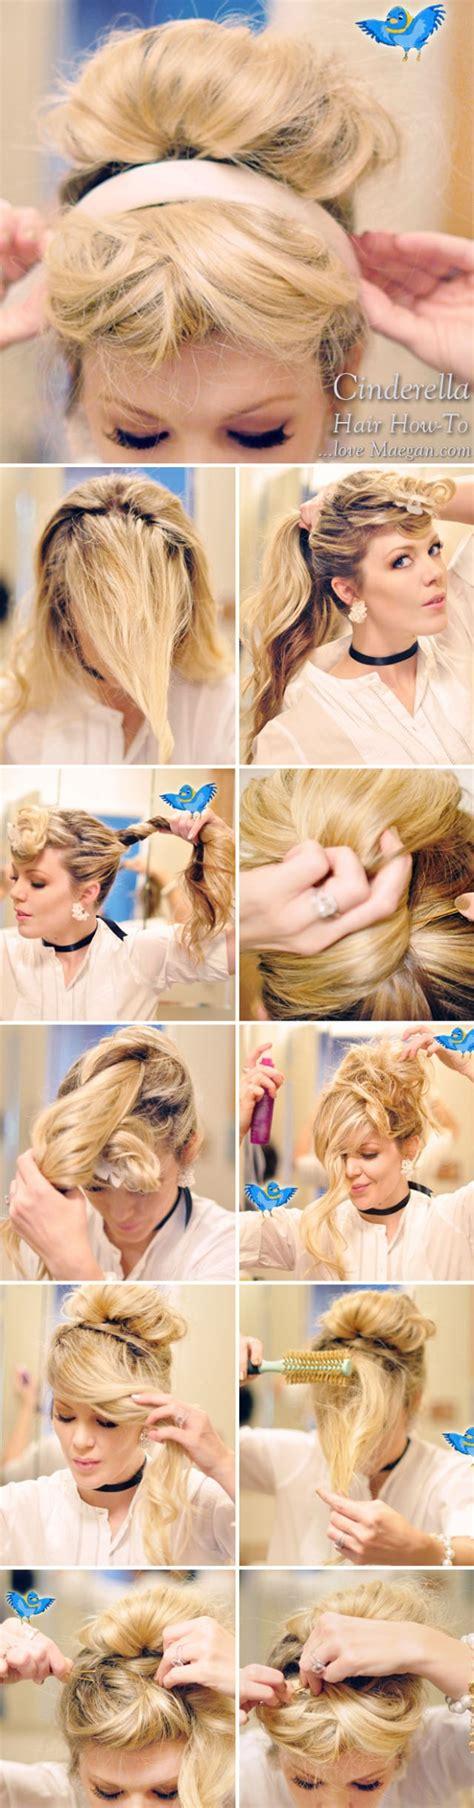 hair and makeup tutorials how to cinderella hair makeup photo tutorial love